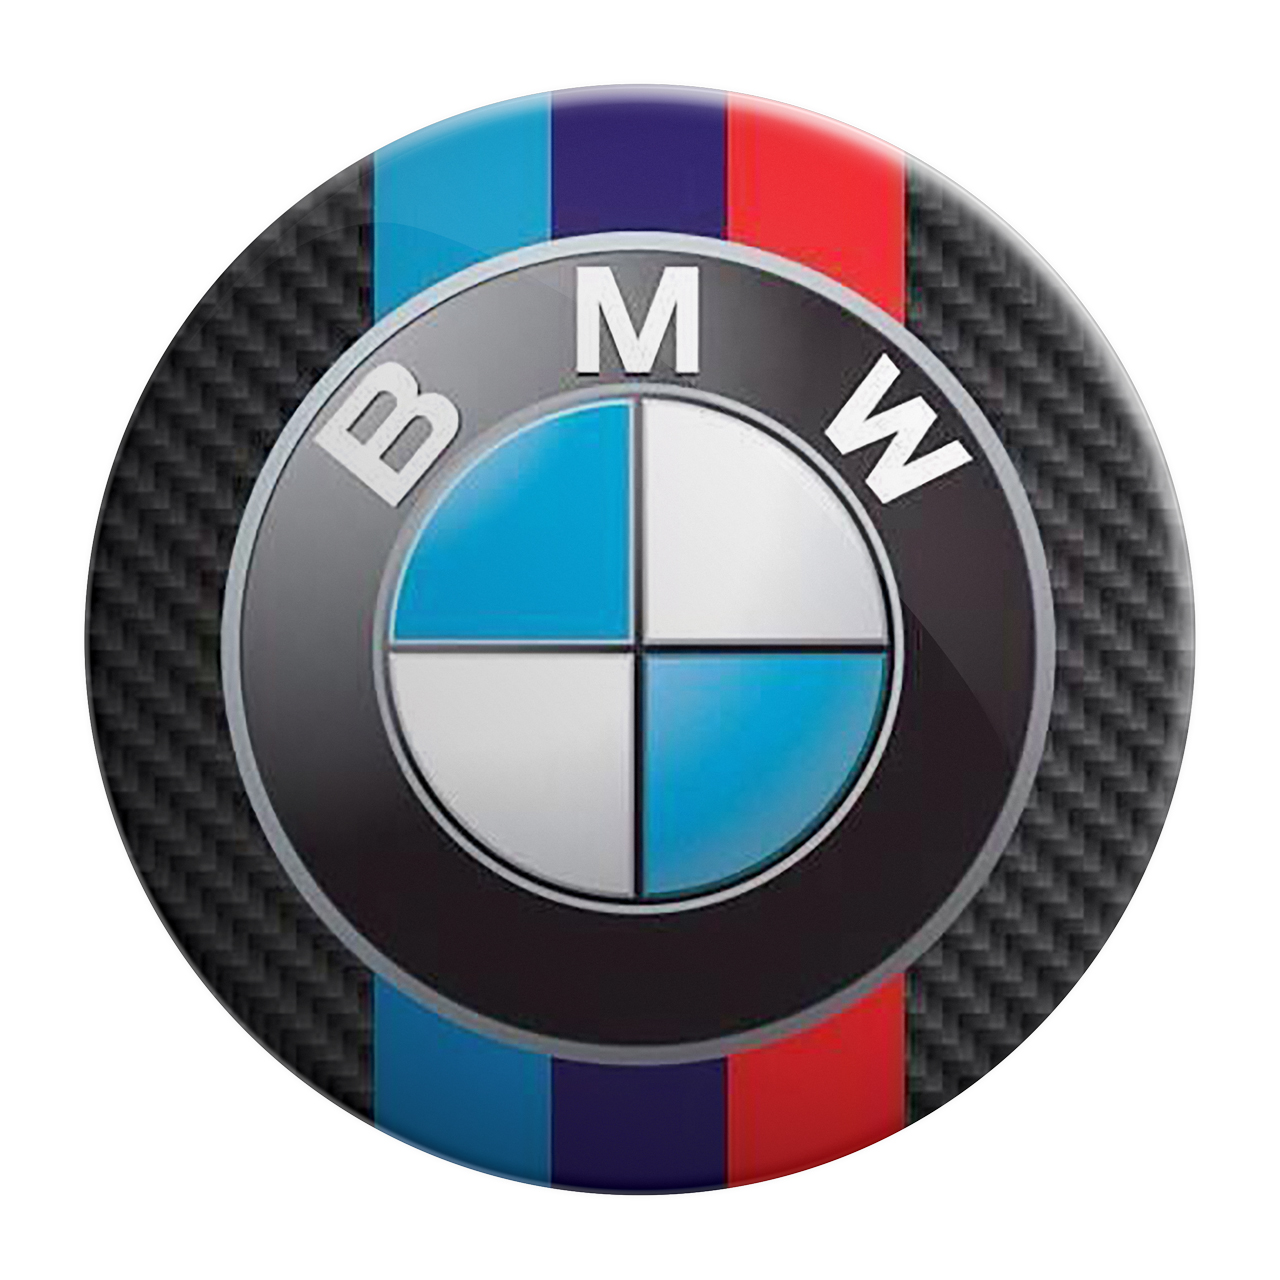 پیکسل طرح BMW کد C601